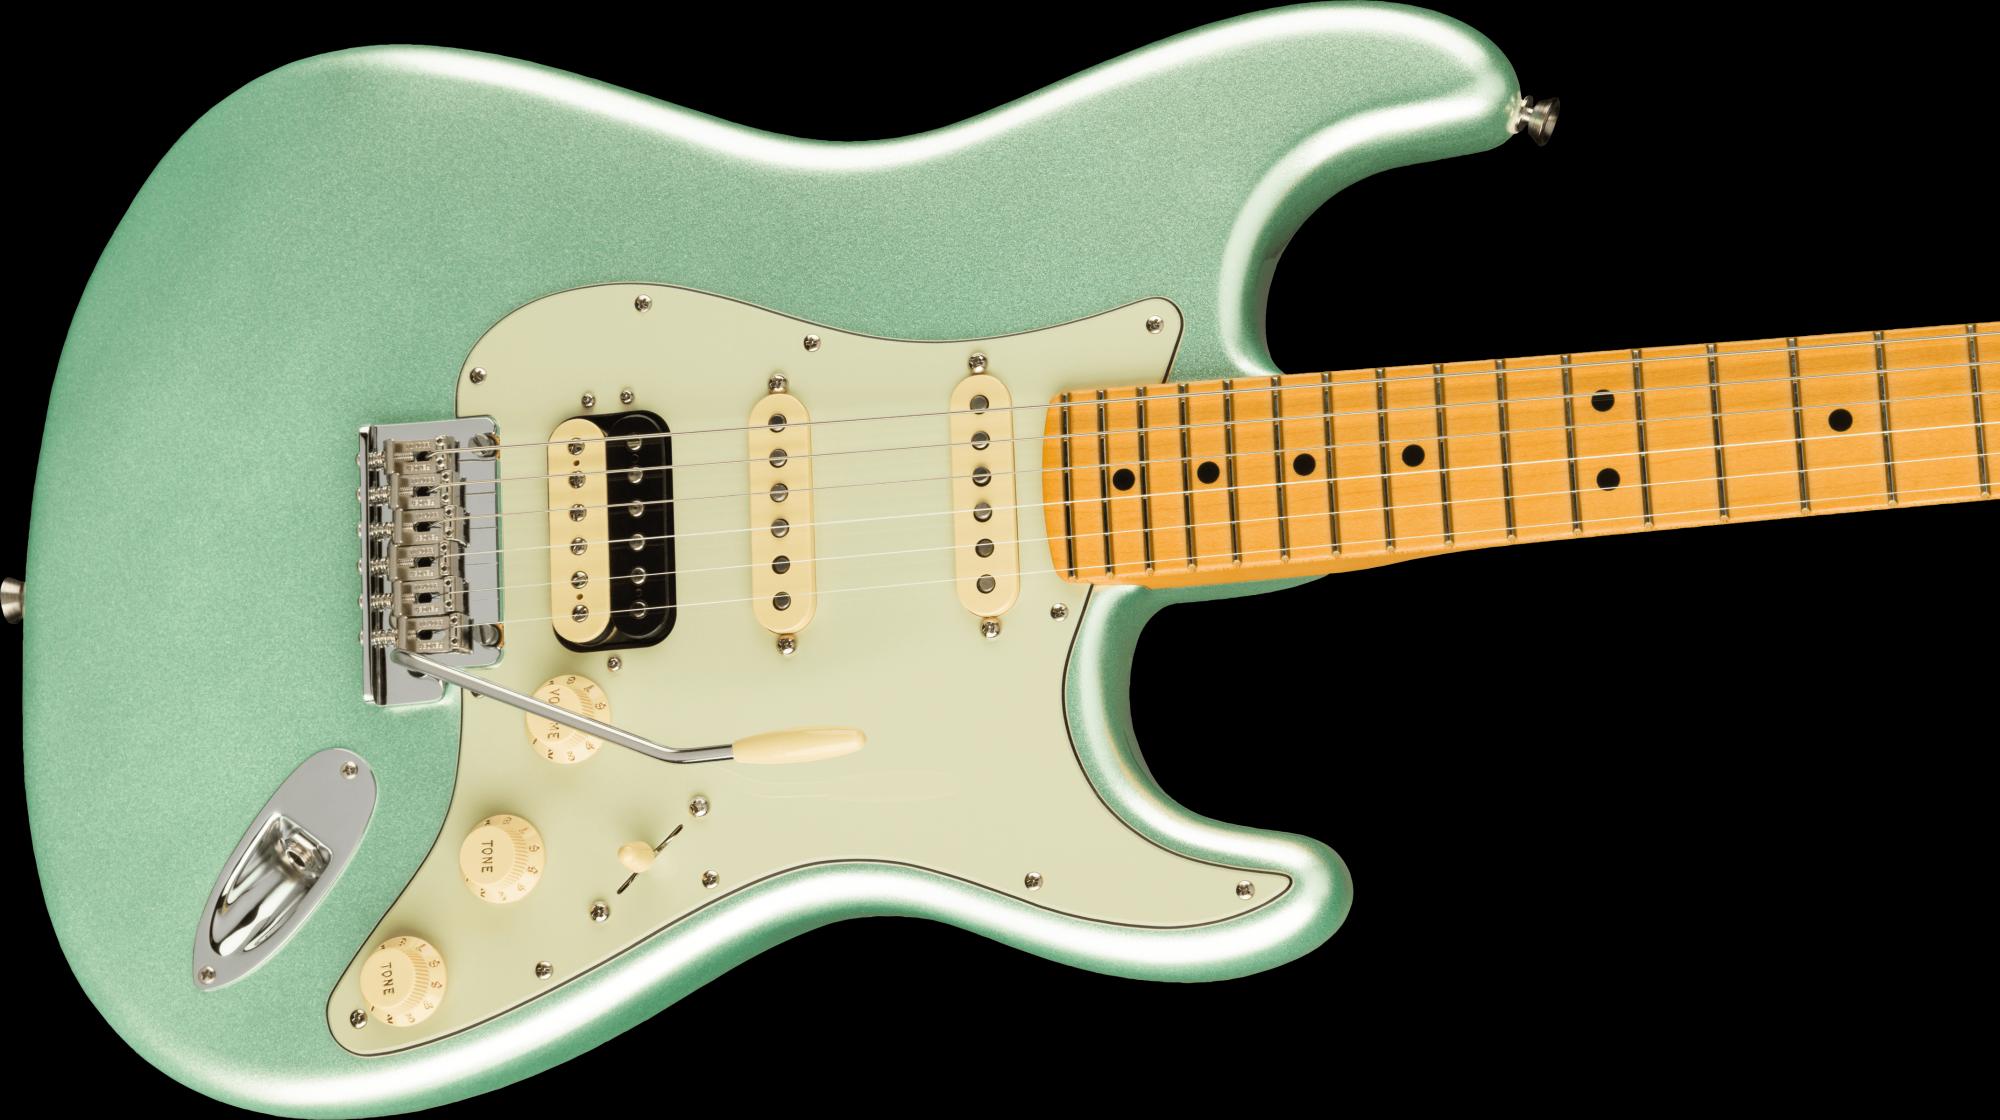 Fender American Professional II Stratocaster HSS Maple Fingerboard - Mystic Surf Green